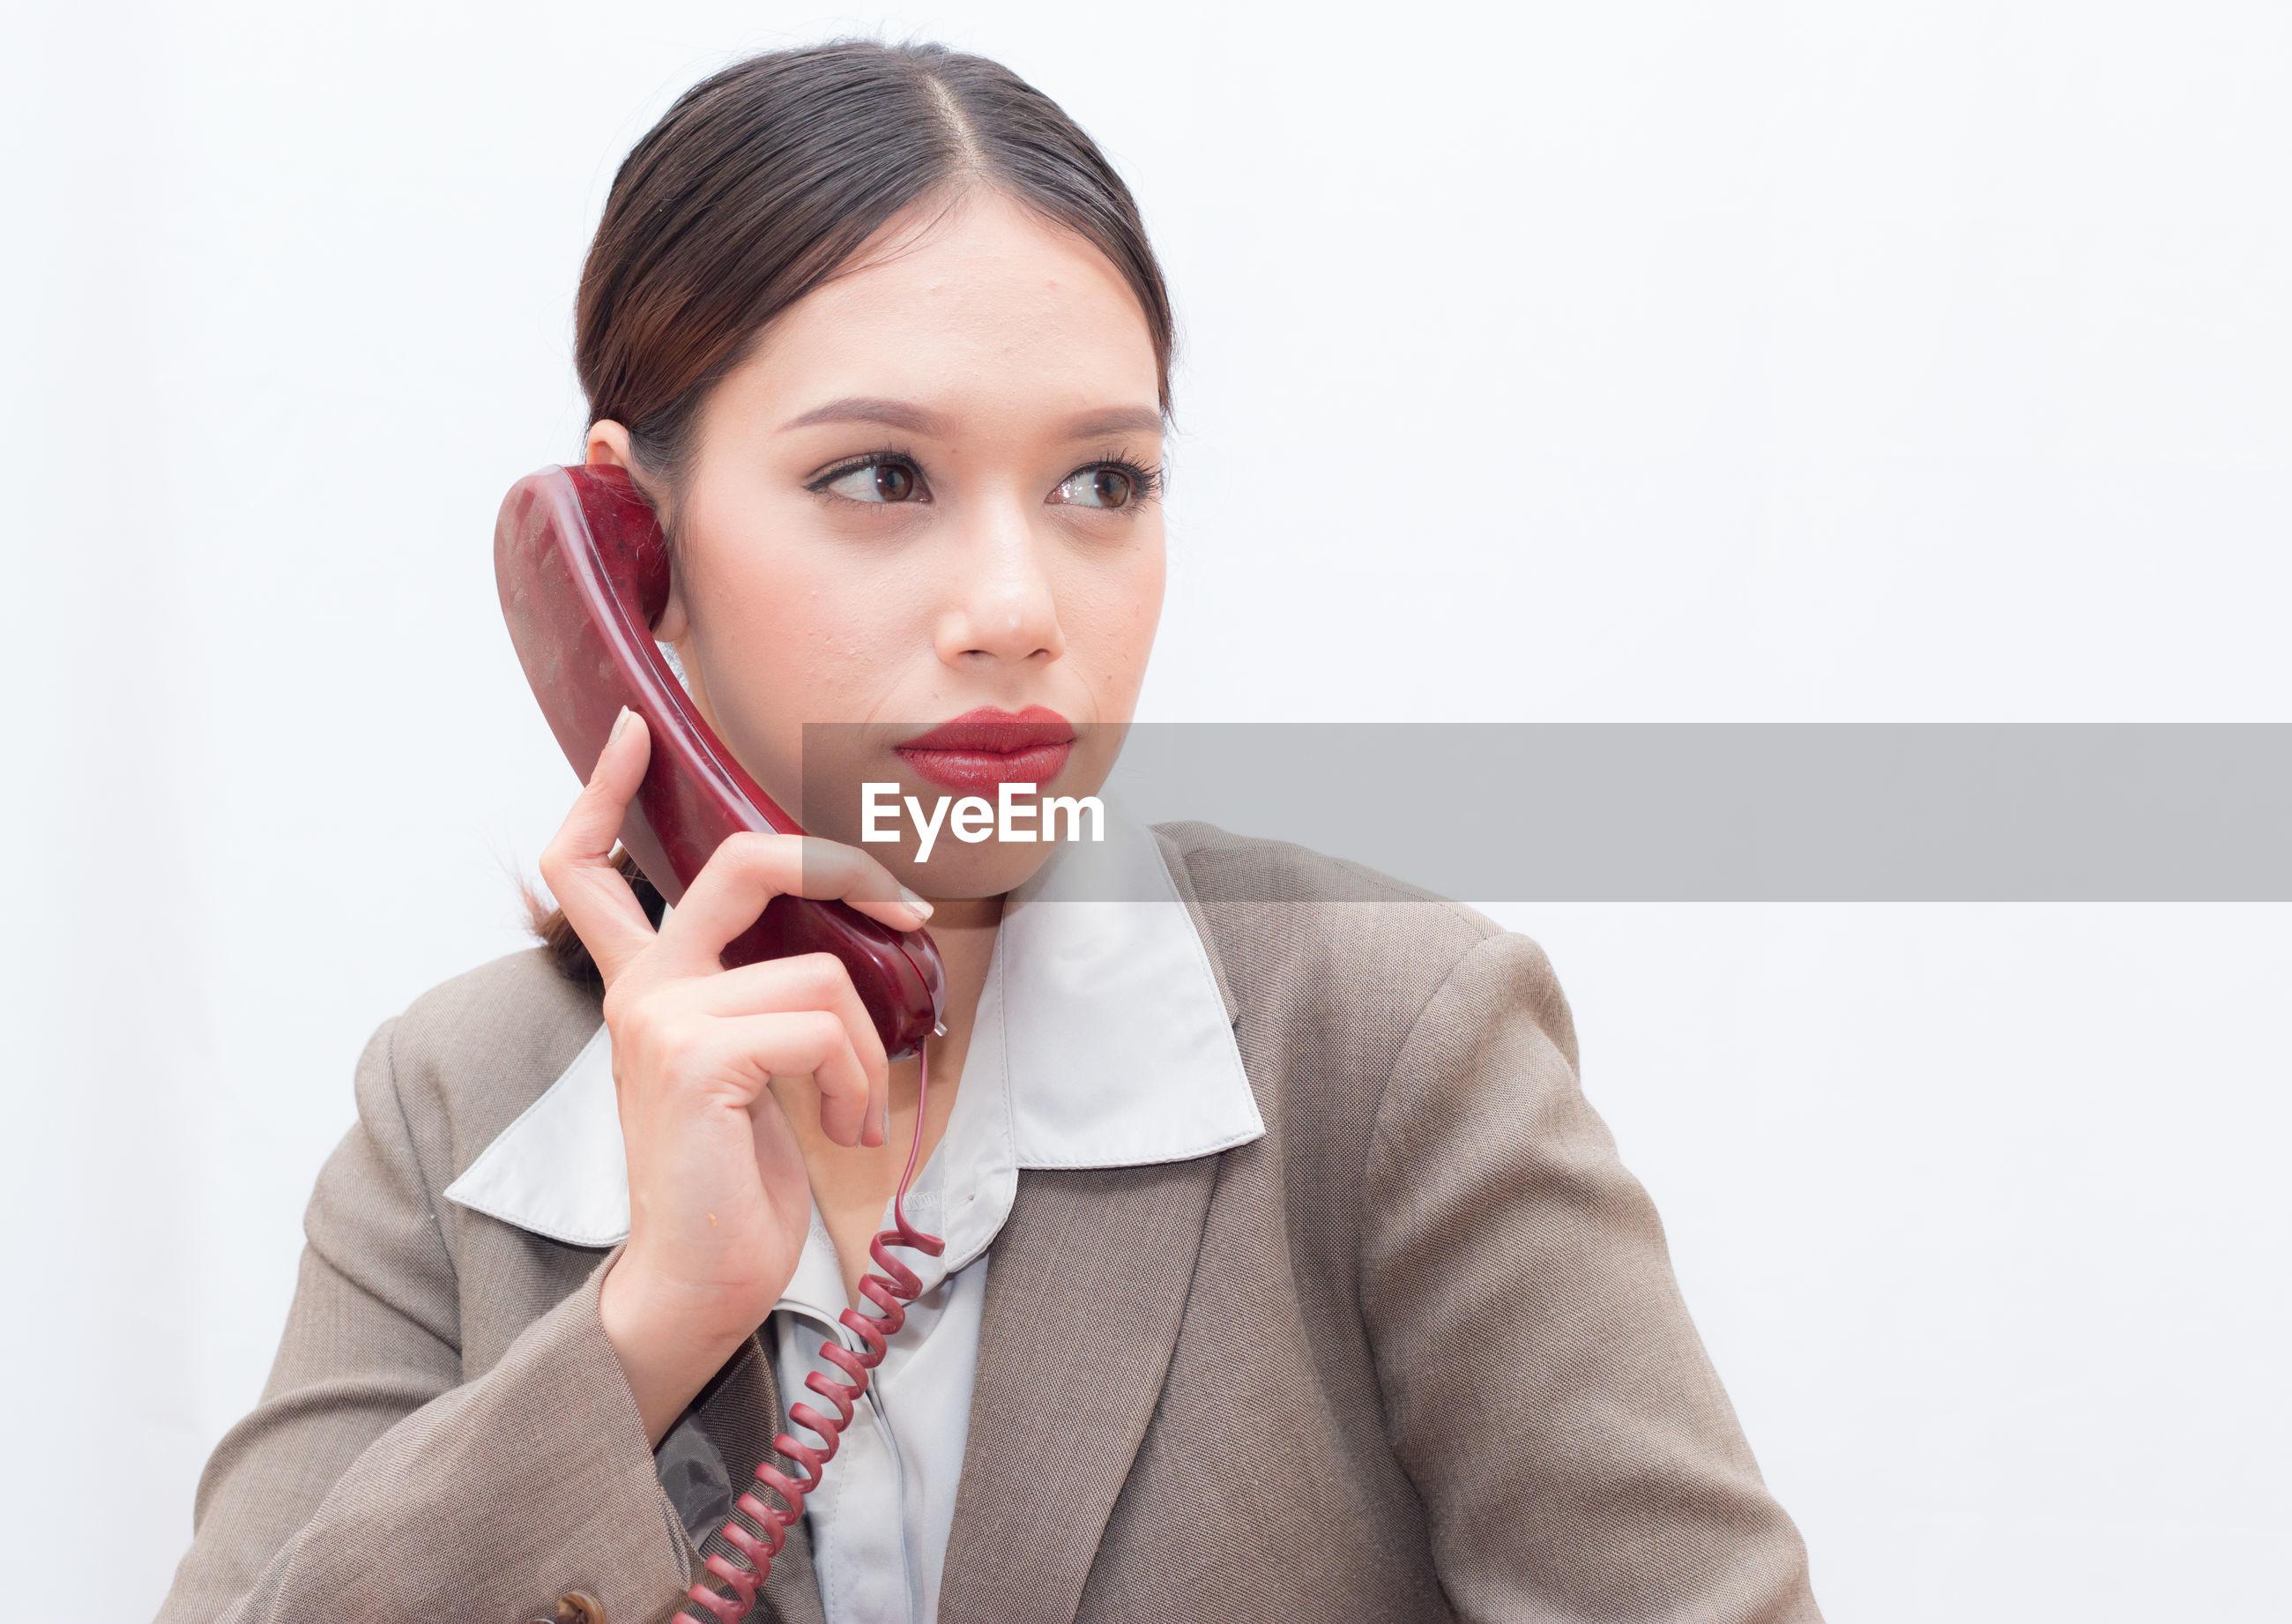 Businesswoman talking on telephone against white background